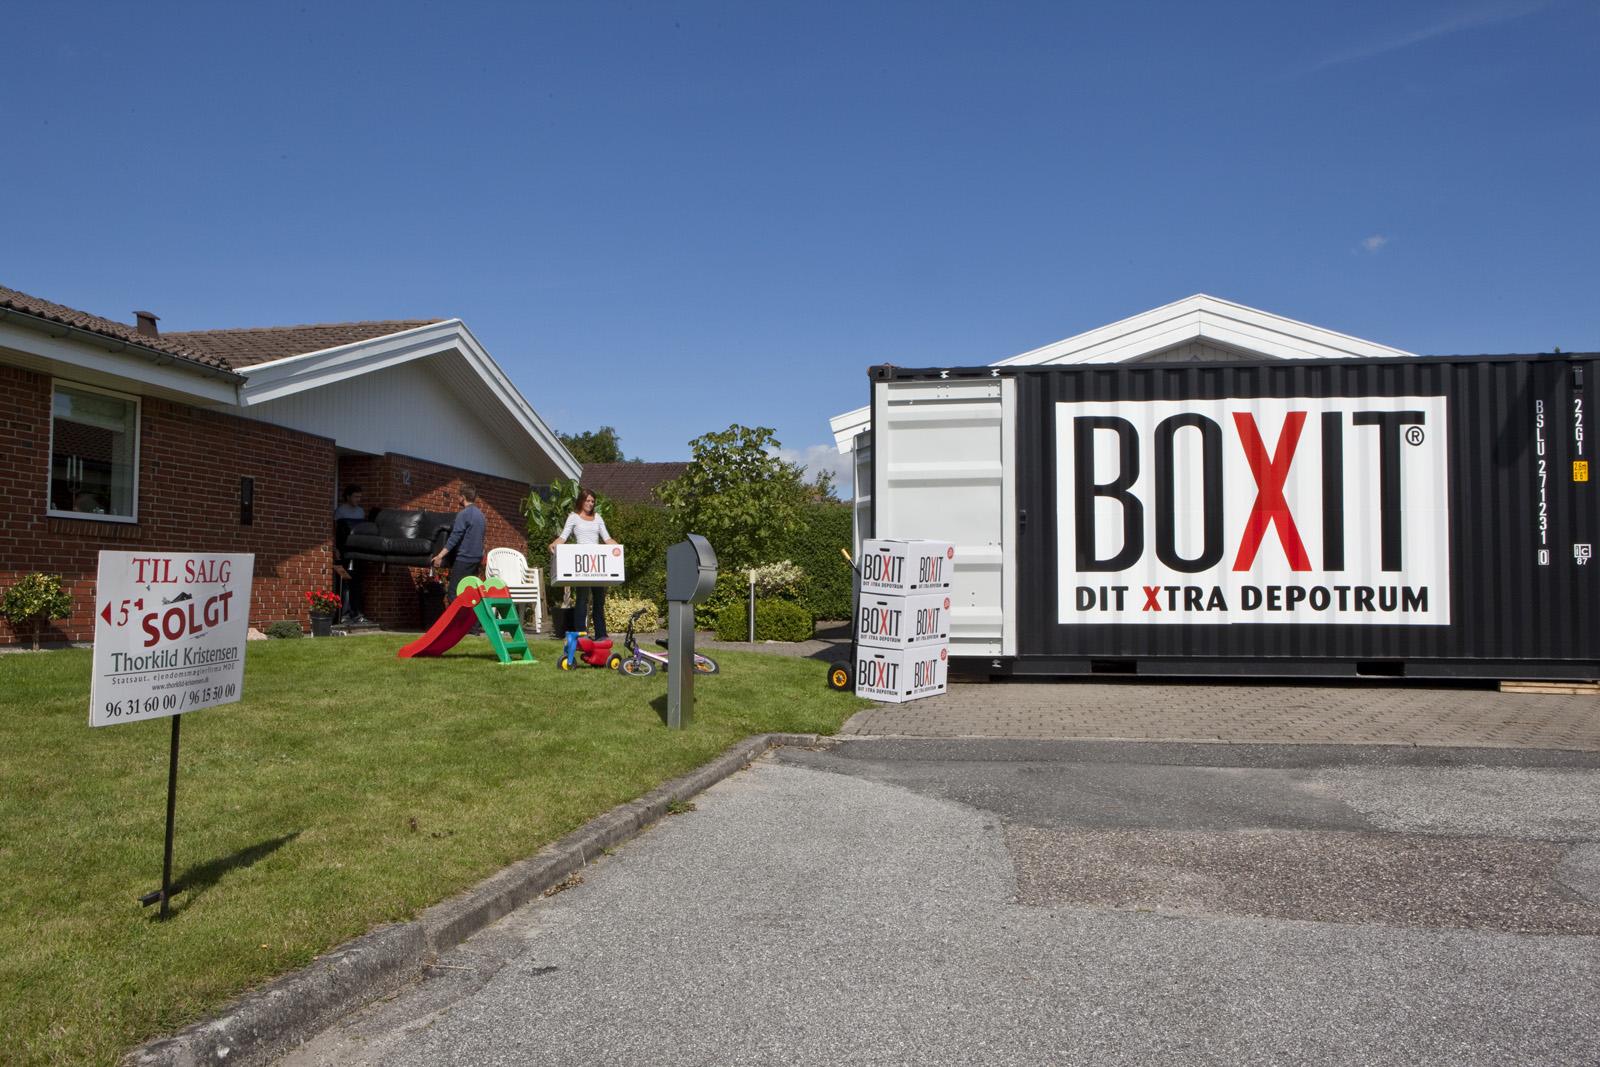 Billig flytning med BOXIT Flyttebox, flyttetrailer eller